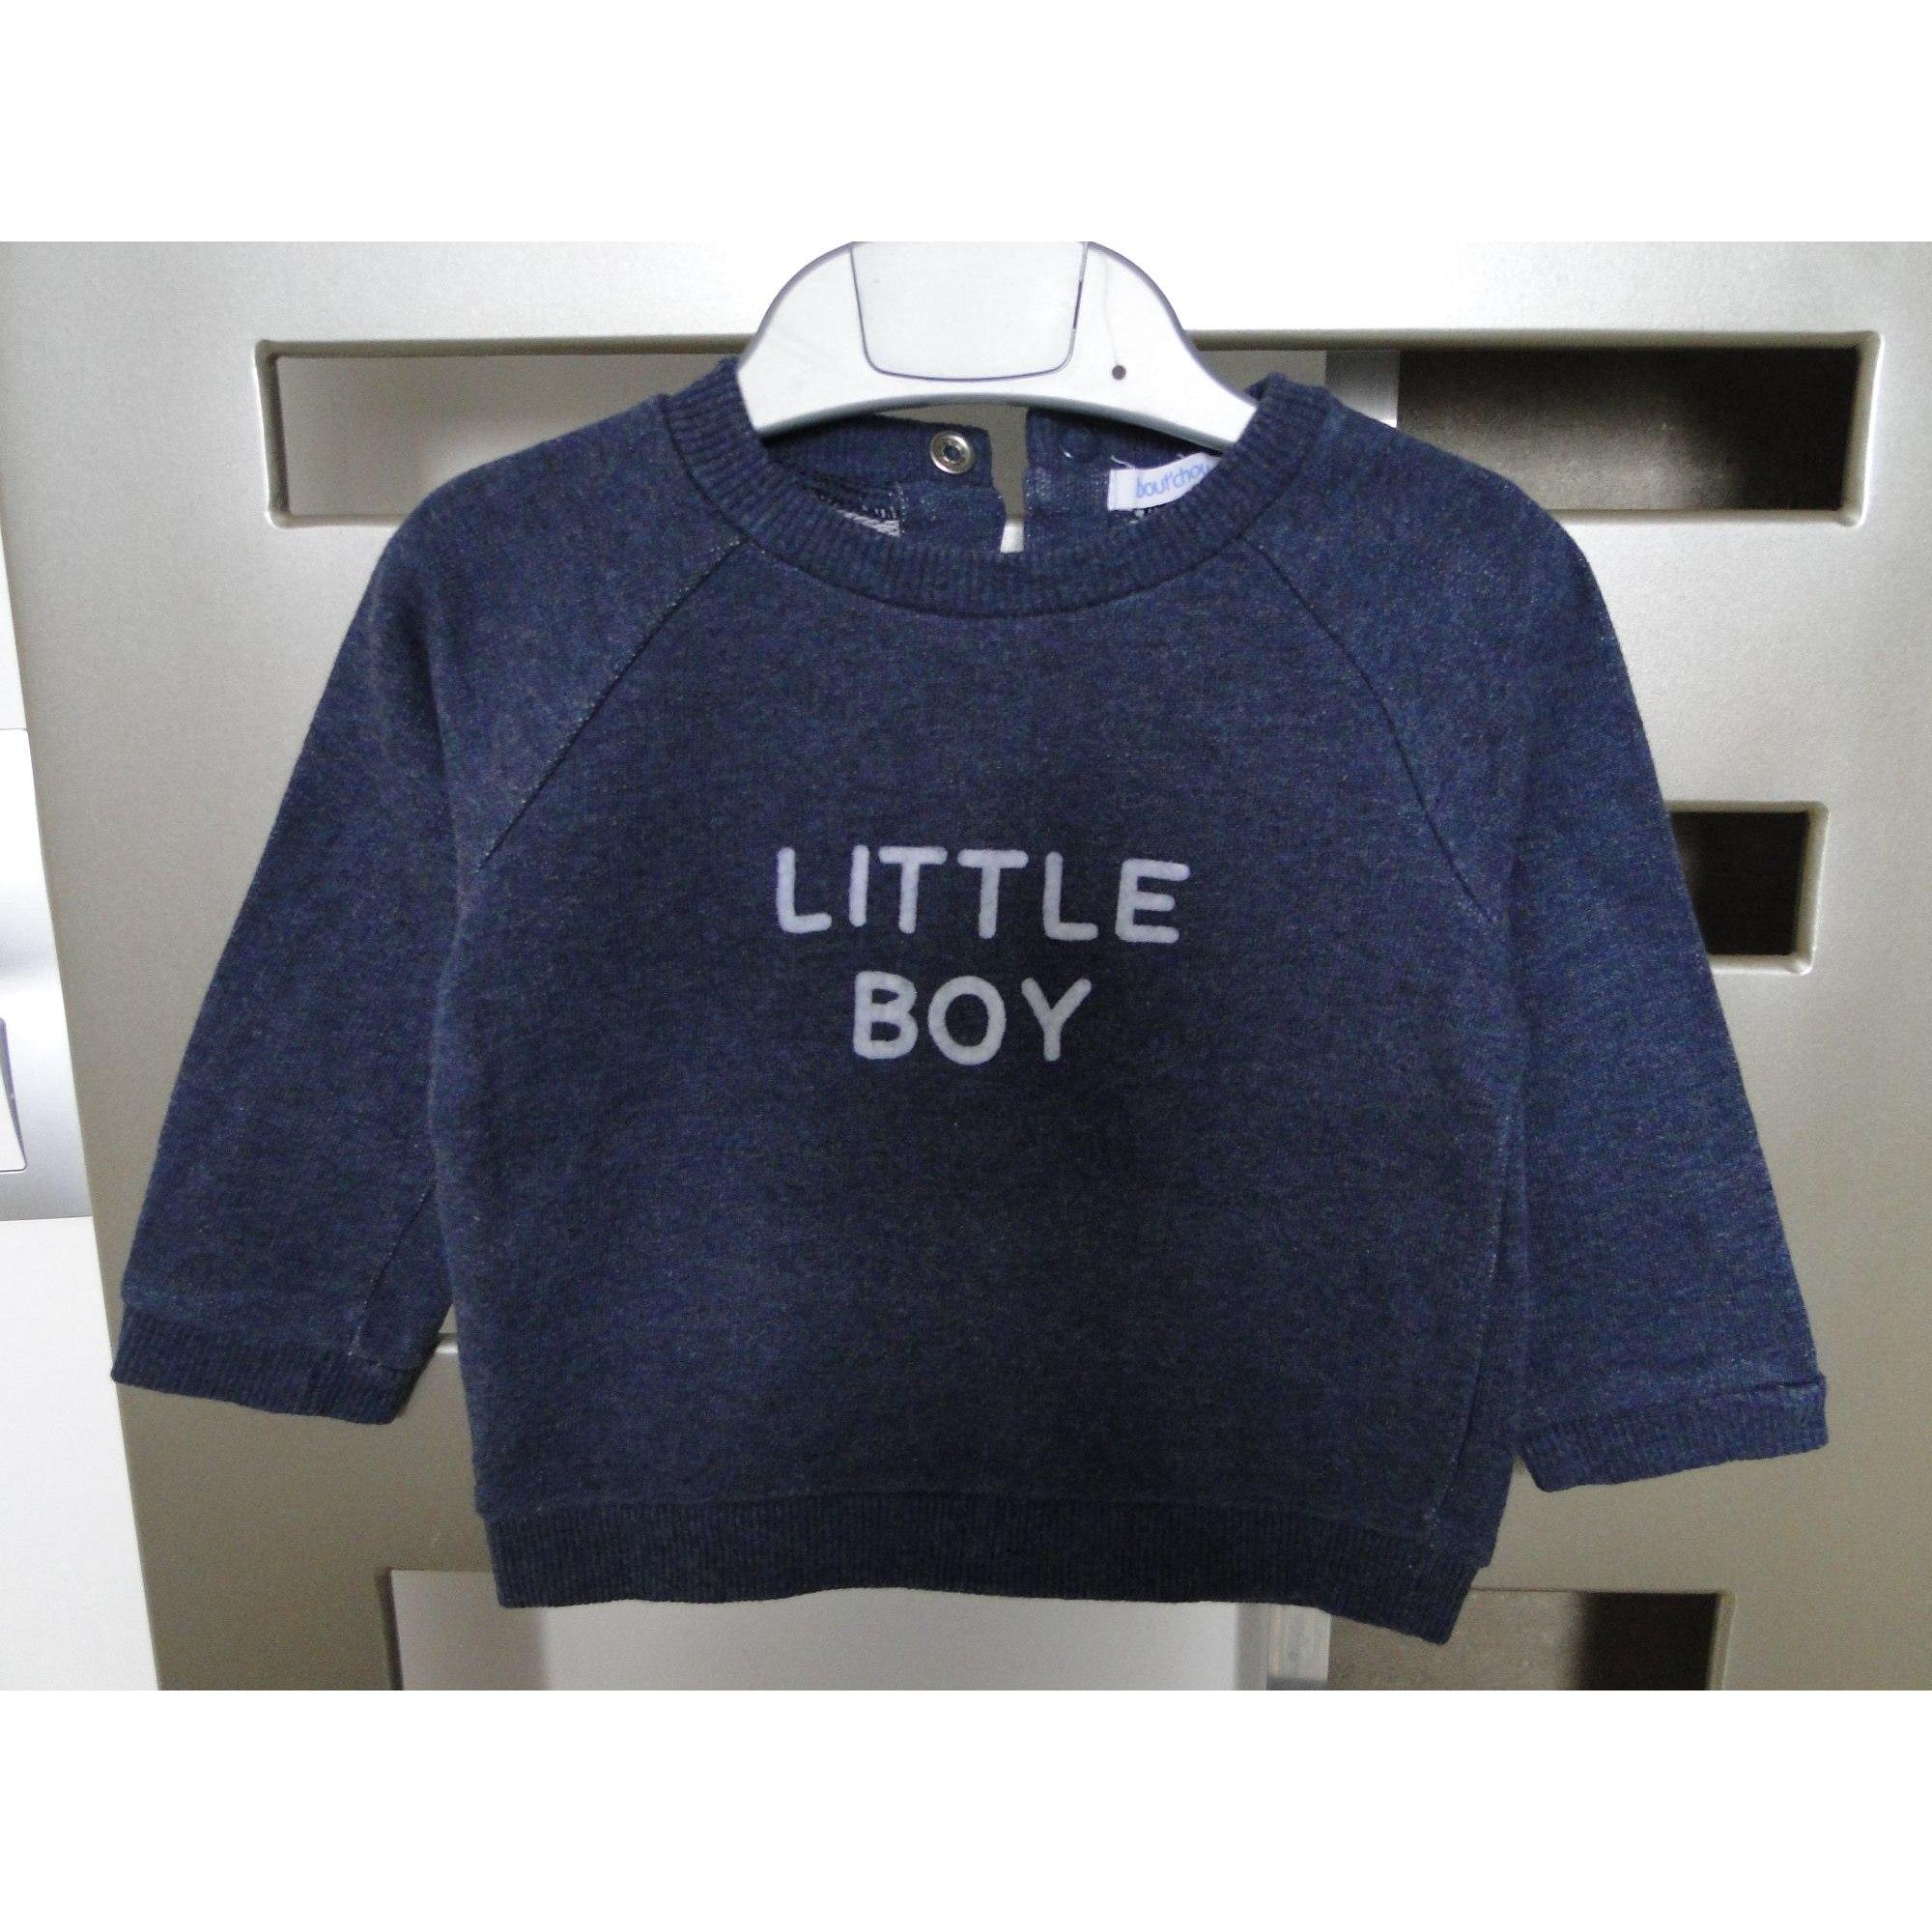 Sweatshirt BOUT'CHOU Blue, navy, turquoise